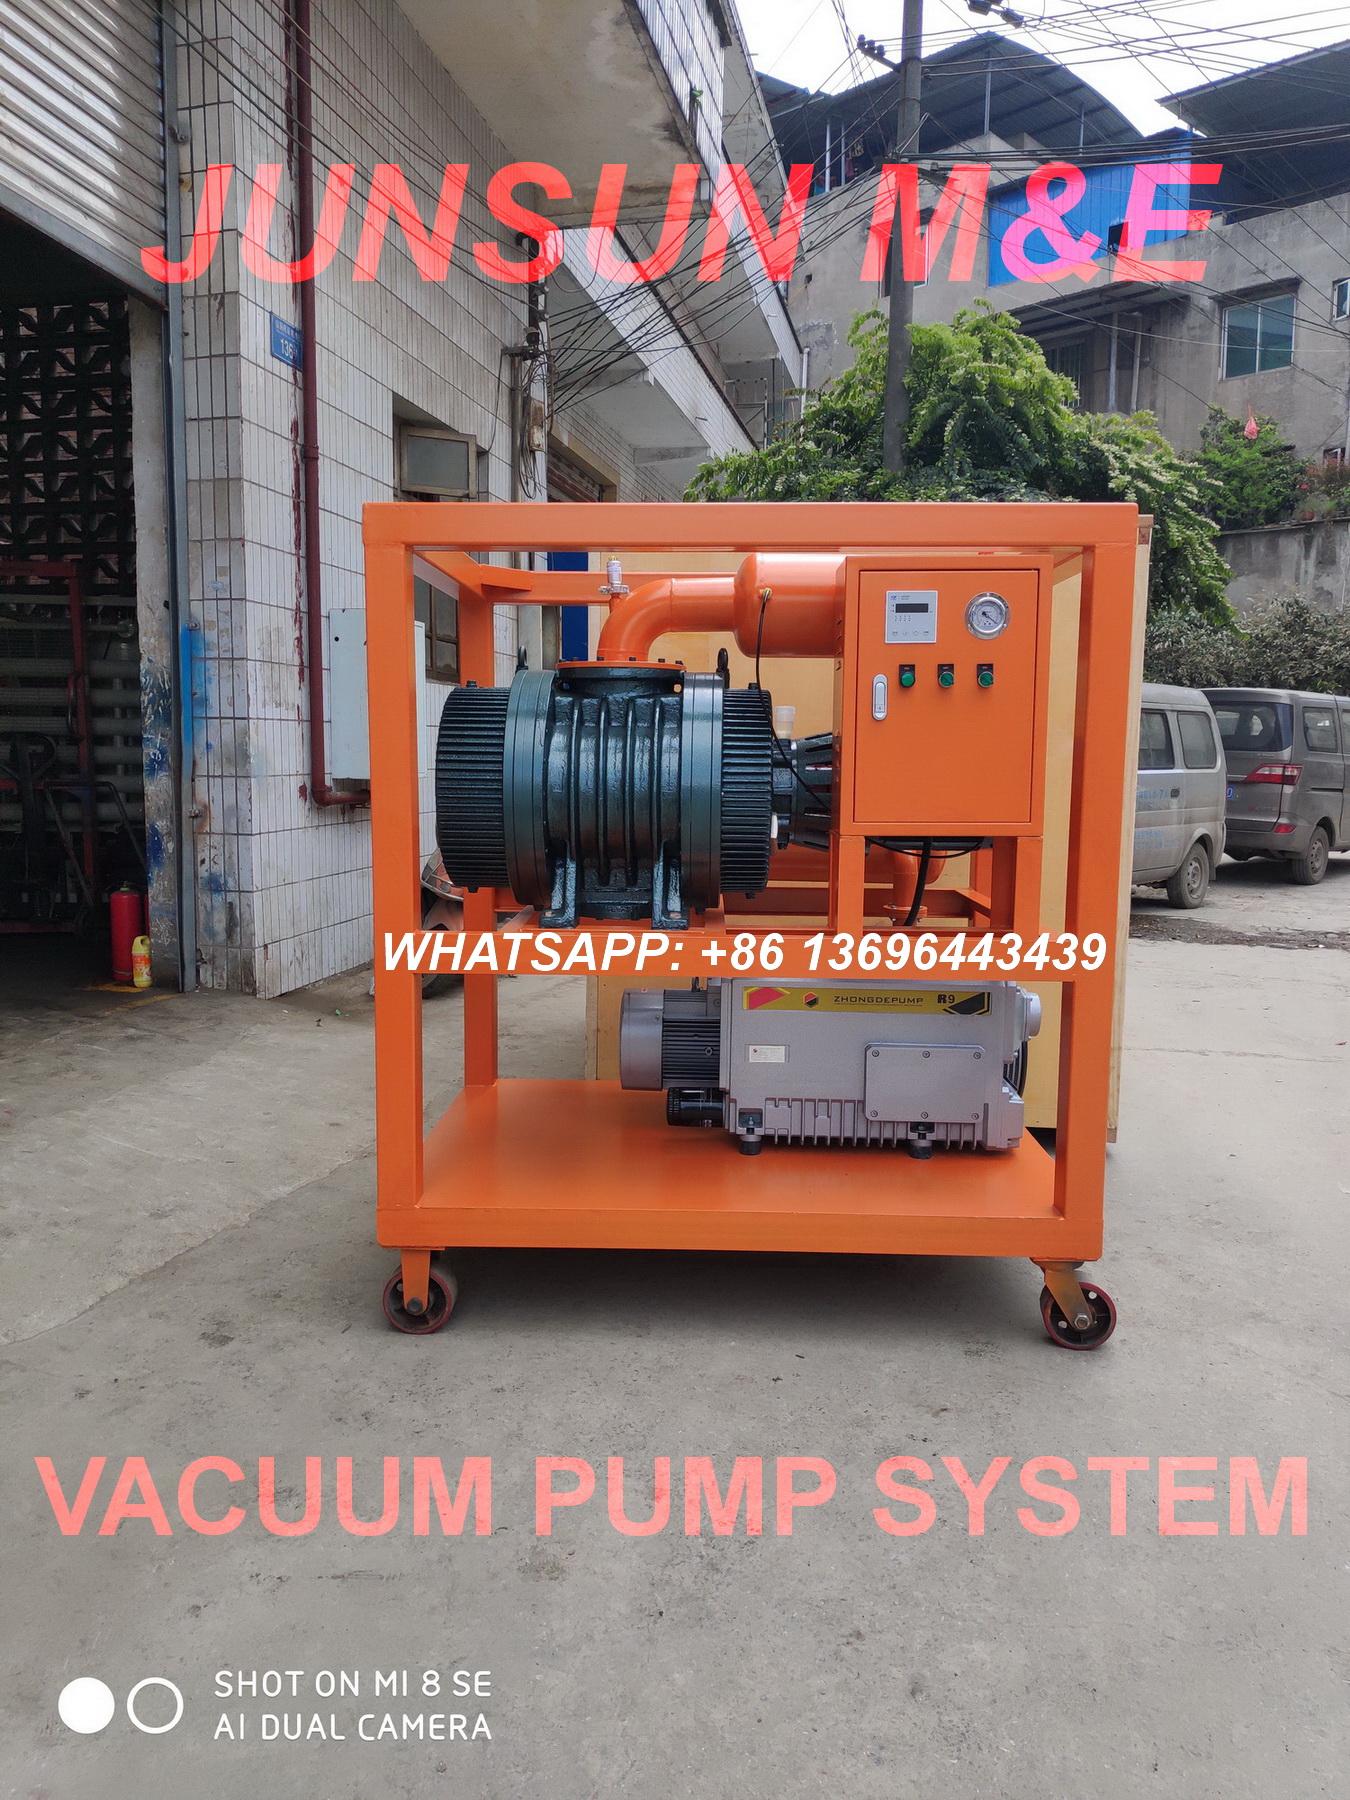 ZJP Series Vacuum Pump System, Vacuum Pumping Group, Two Stage High Vacuum Evacuation Equipment